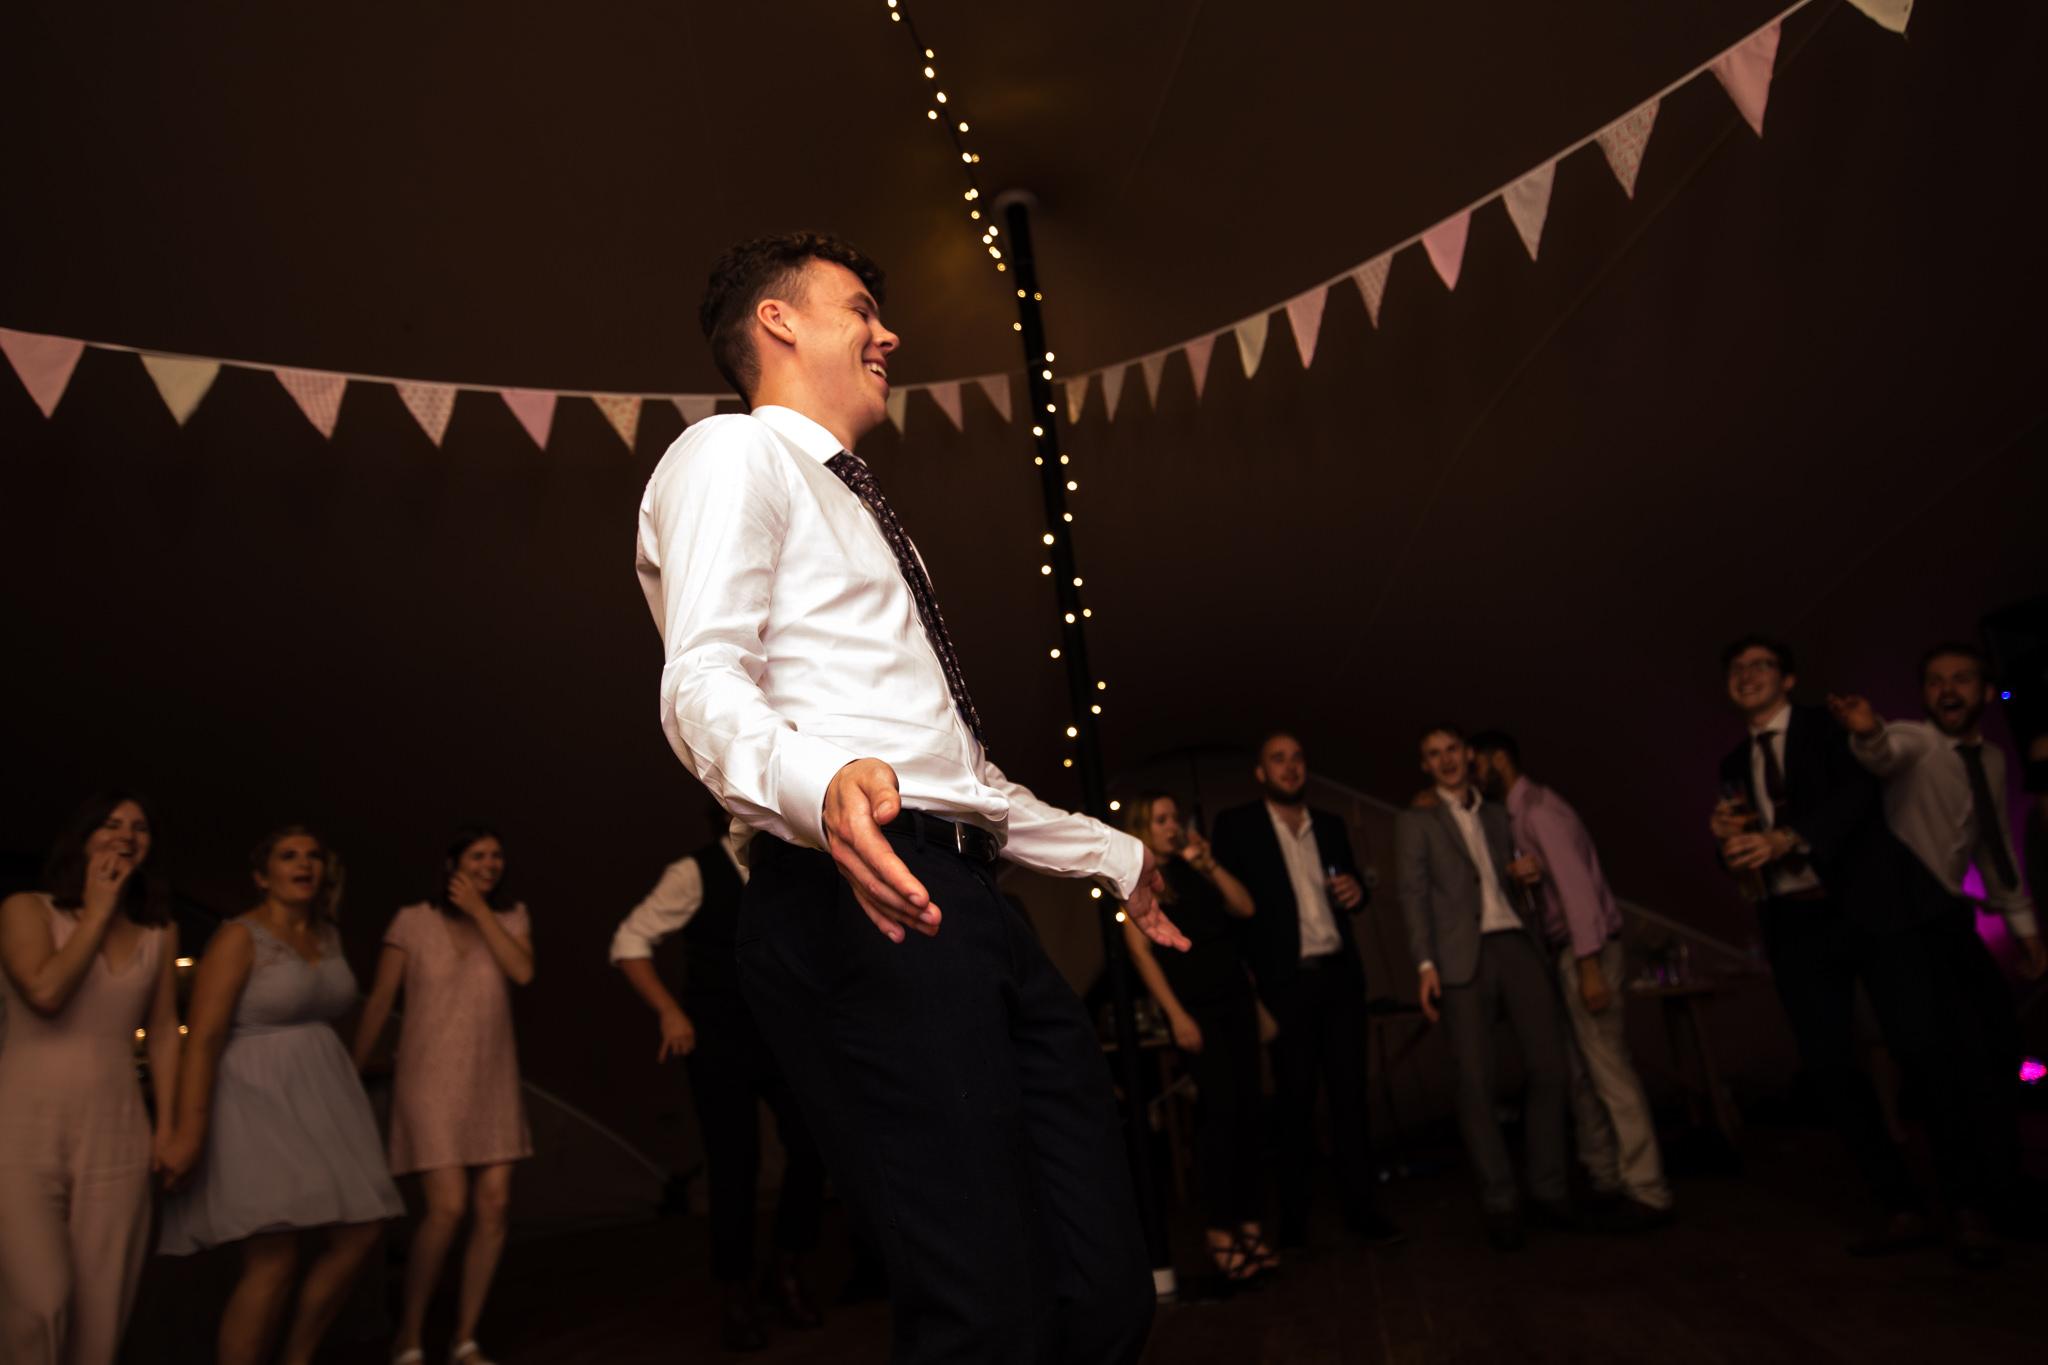 nottingham wedding89